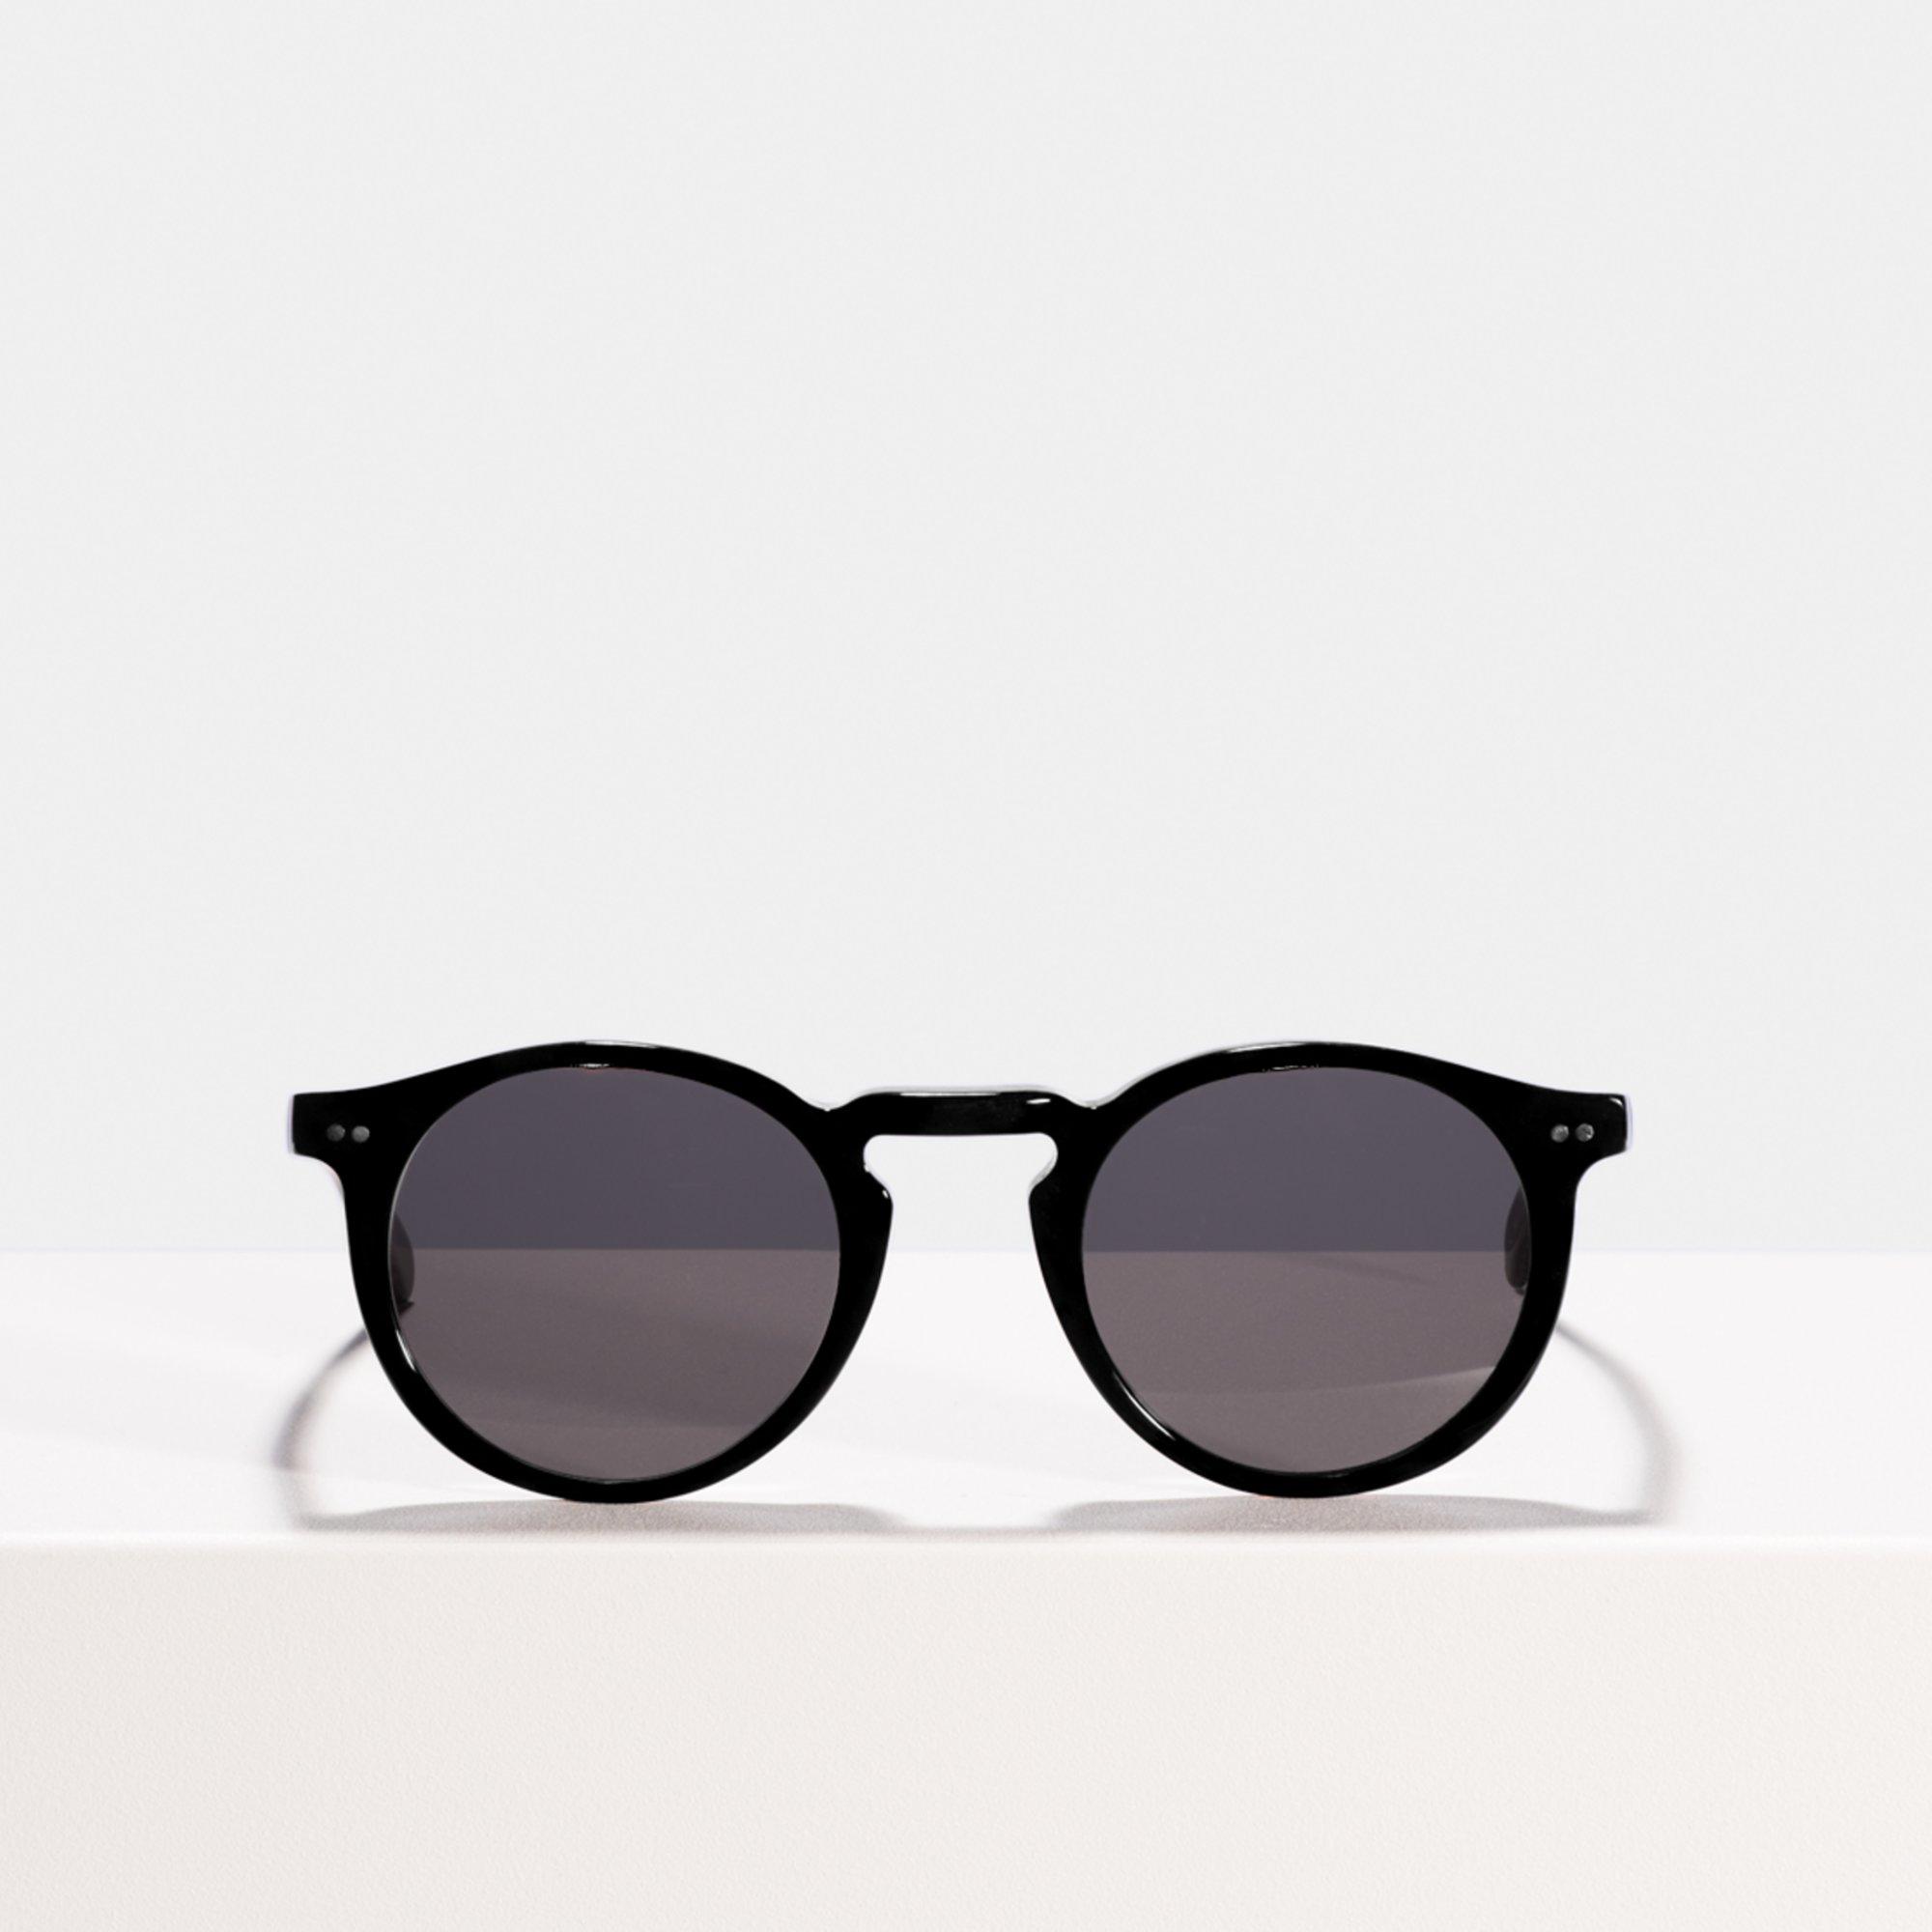 Ace & Tate Sunglasses | round acetate in Black